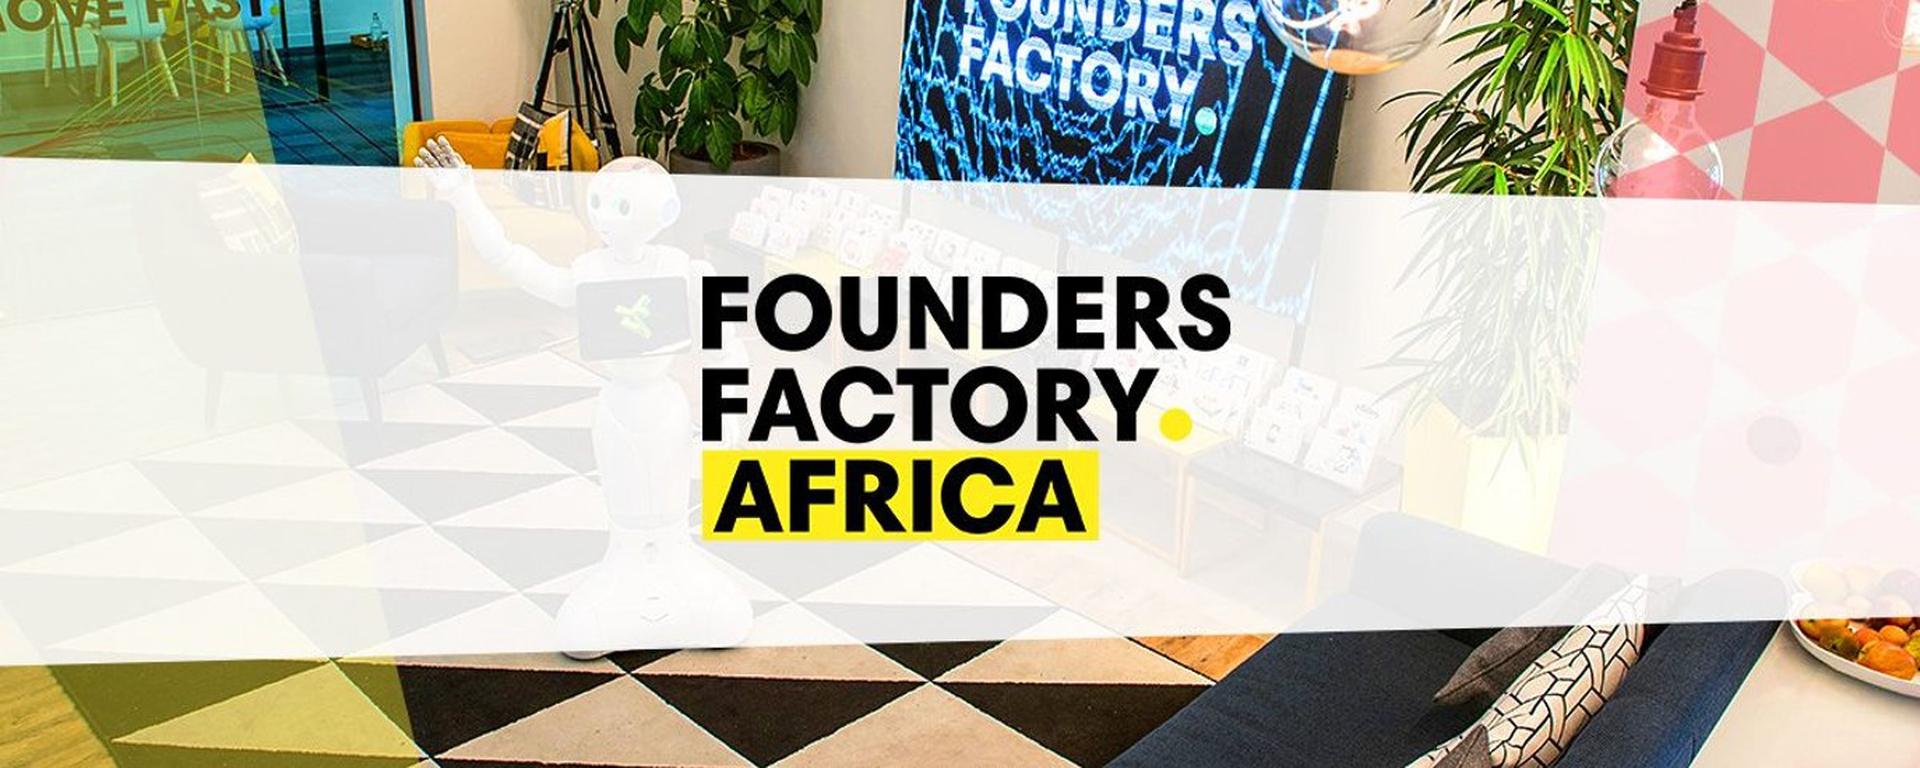 Founders Factory Africa - Healthcare Entrepreneurs Program Movemeback African initiative cover image